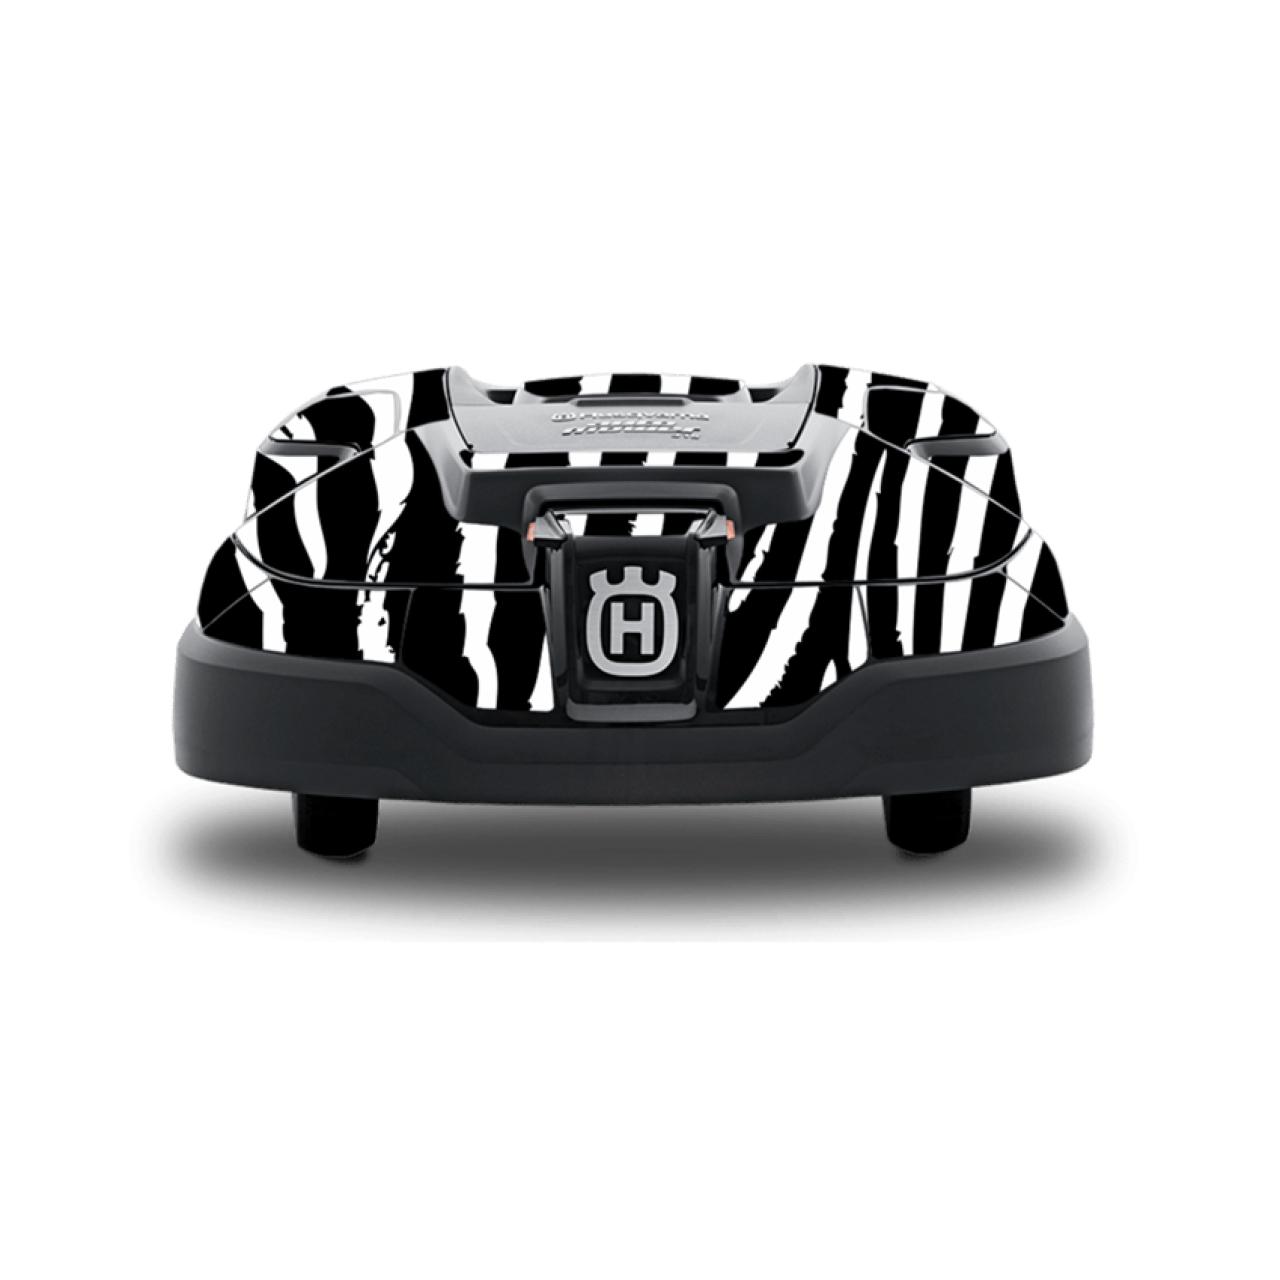 Sticker-Set Zebra (305 2020-)